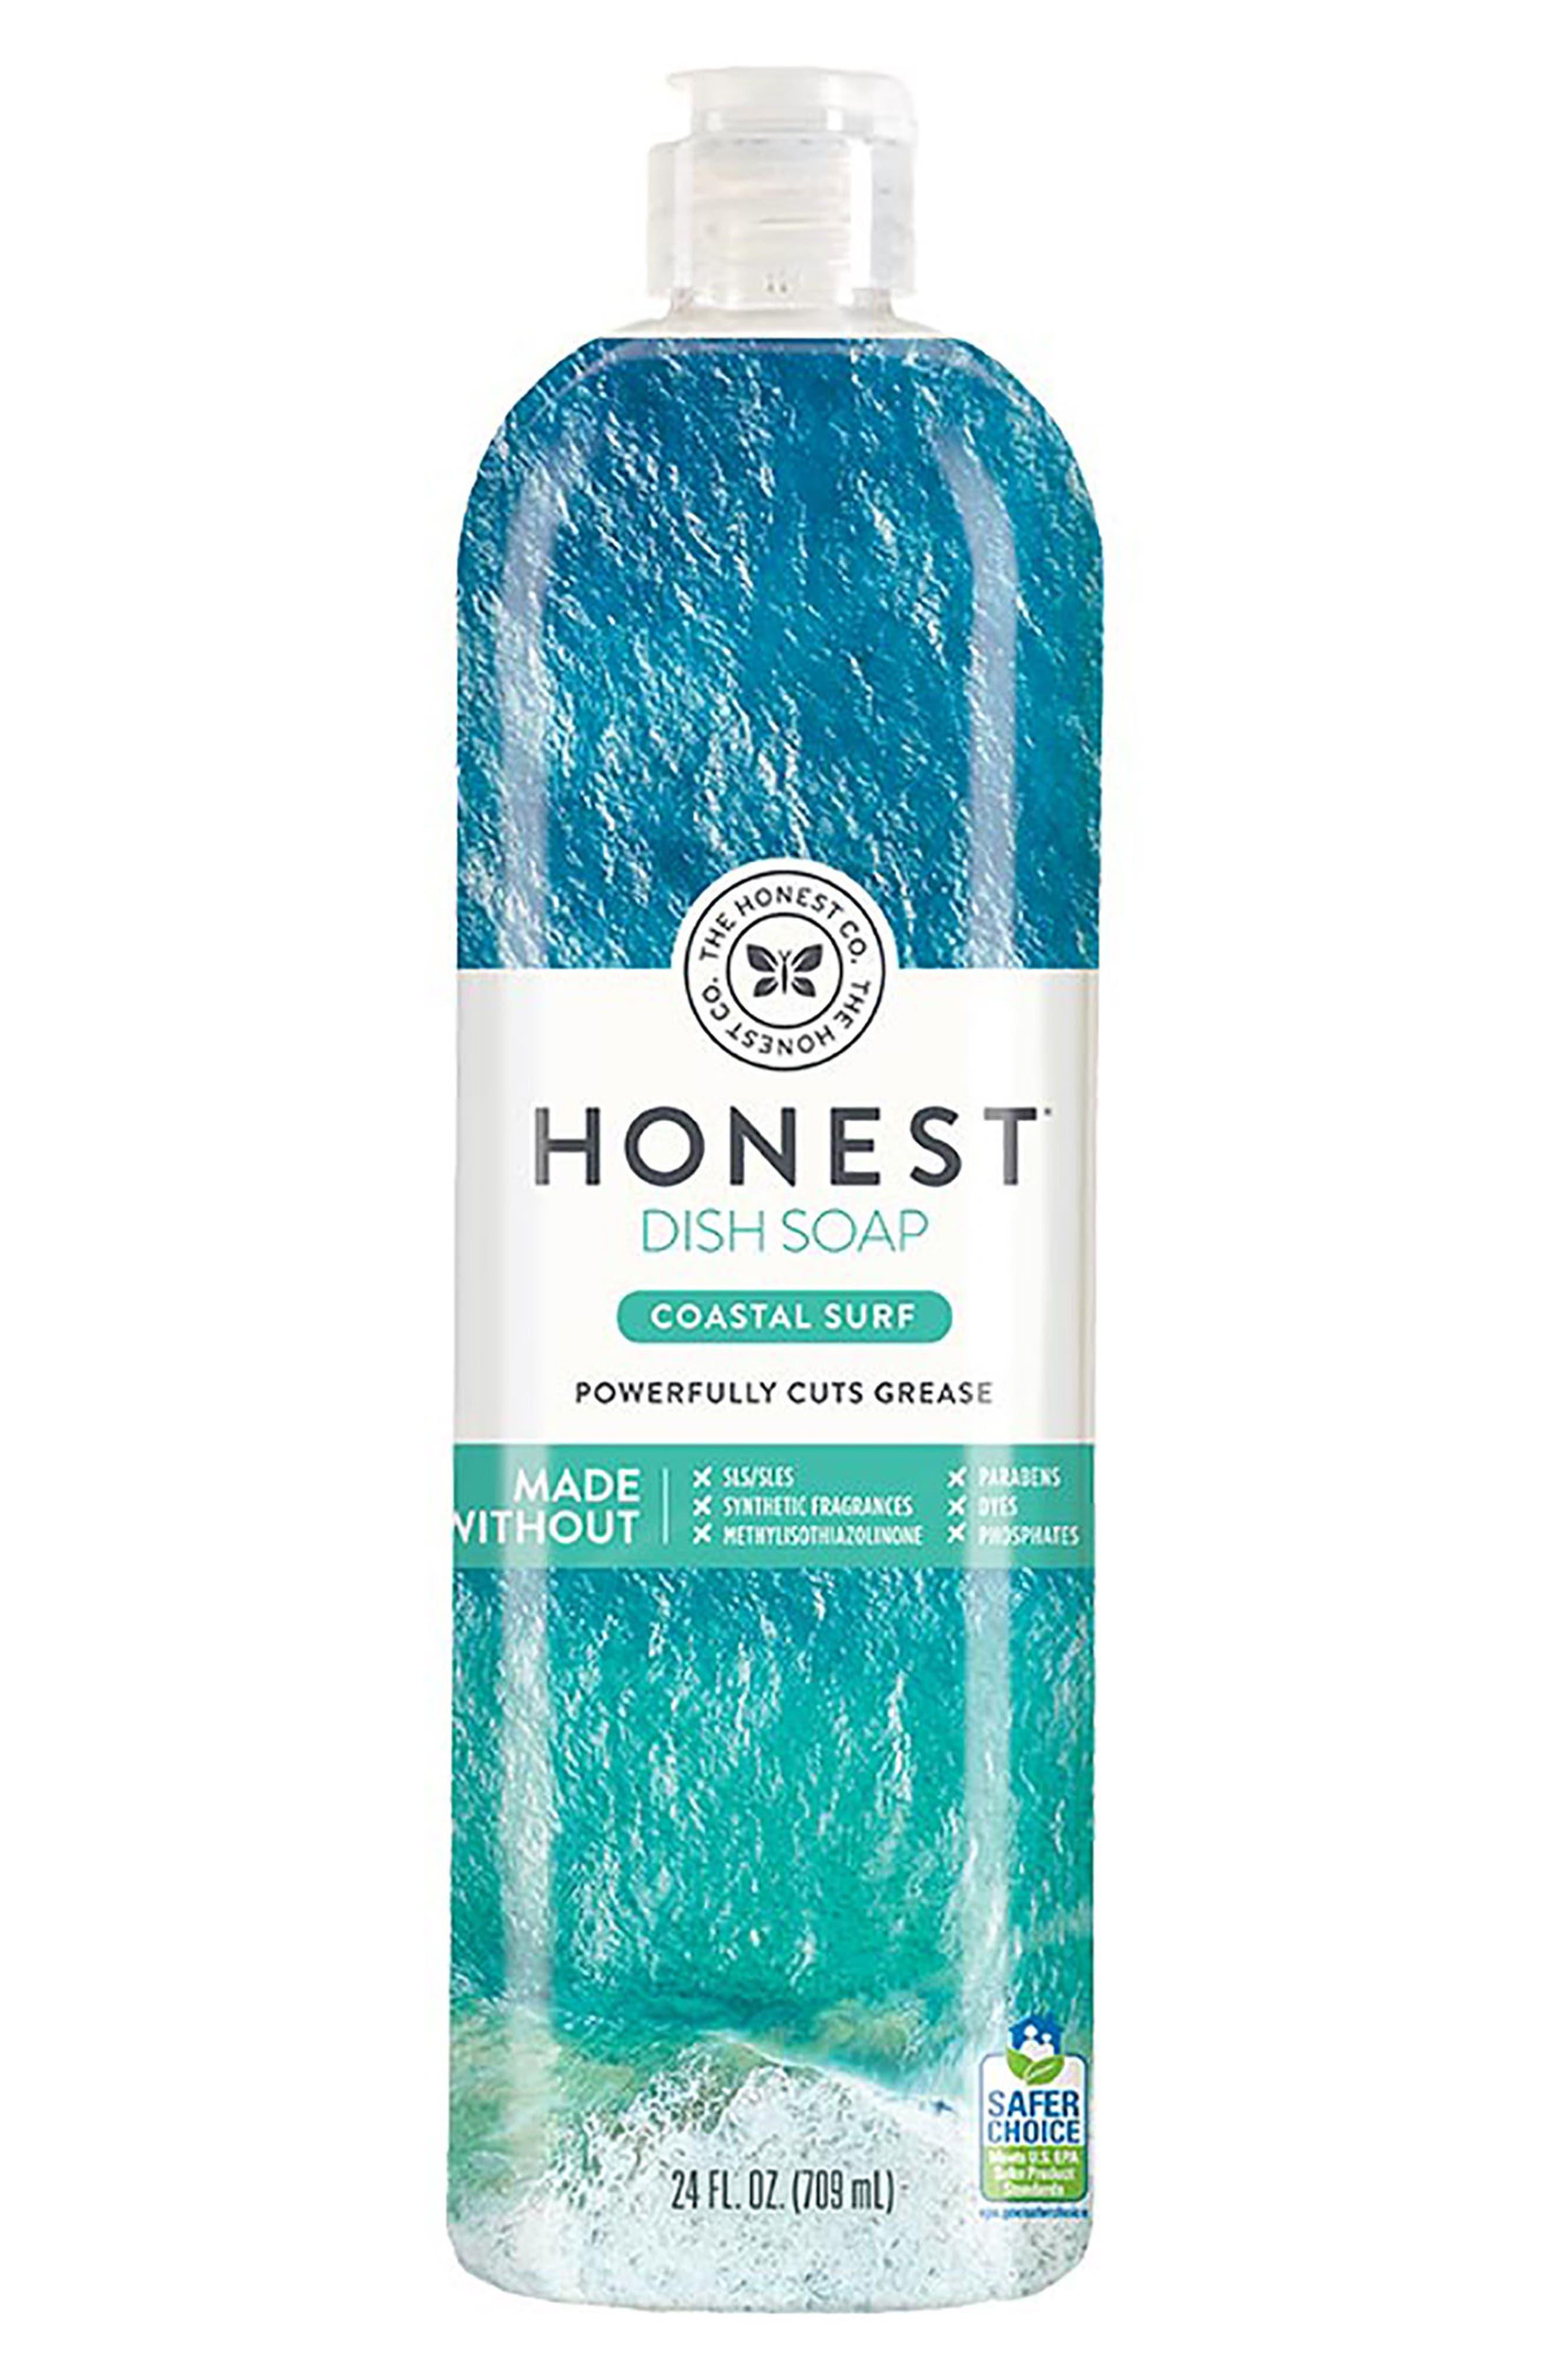 Alternate Image 1 Selected - The Honest Company Coastal Surf Dish Soap